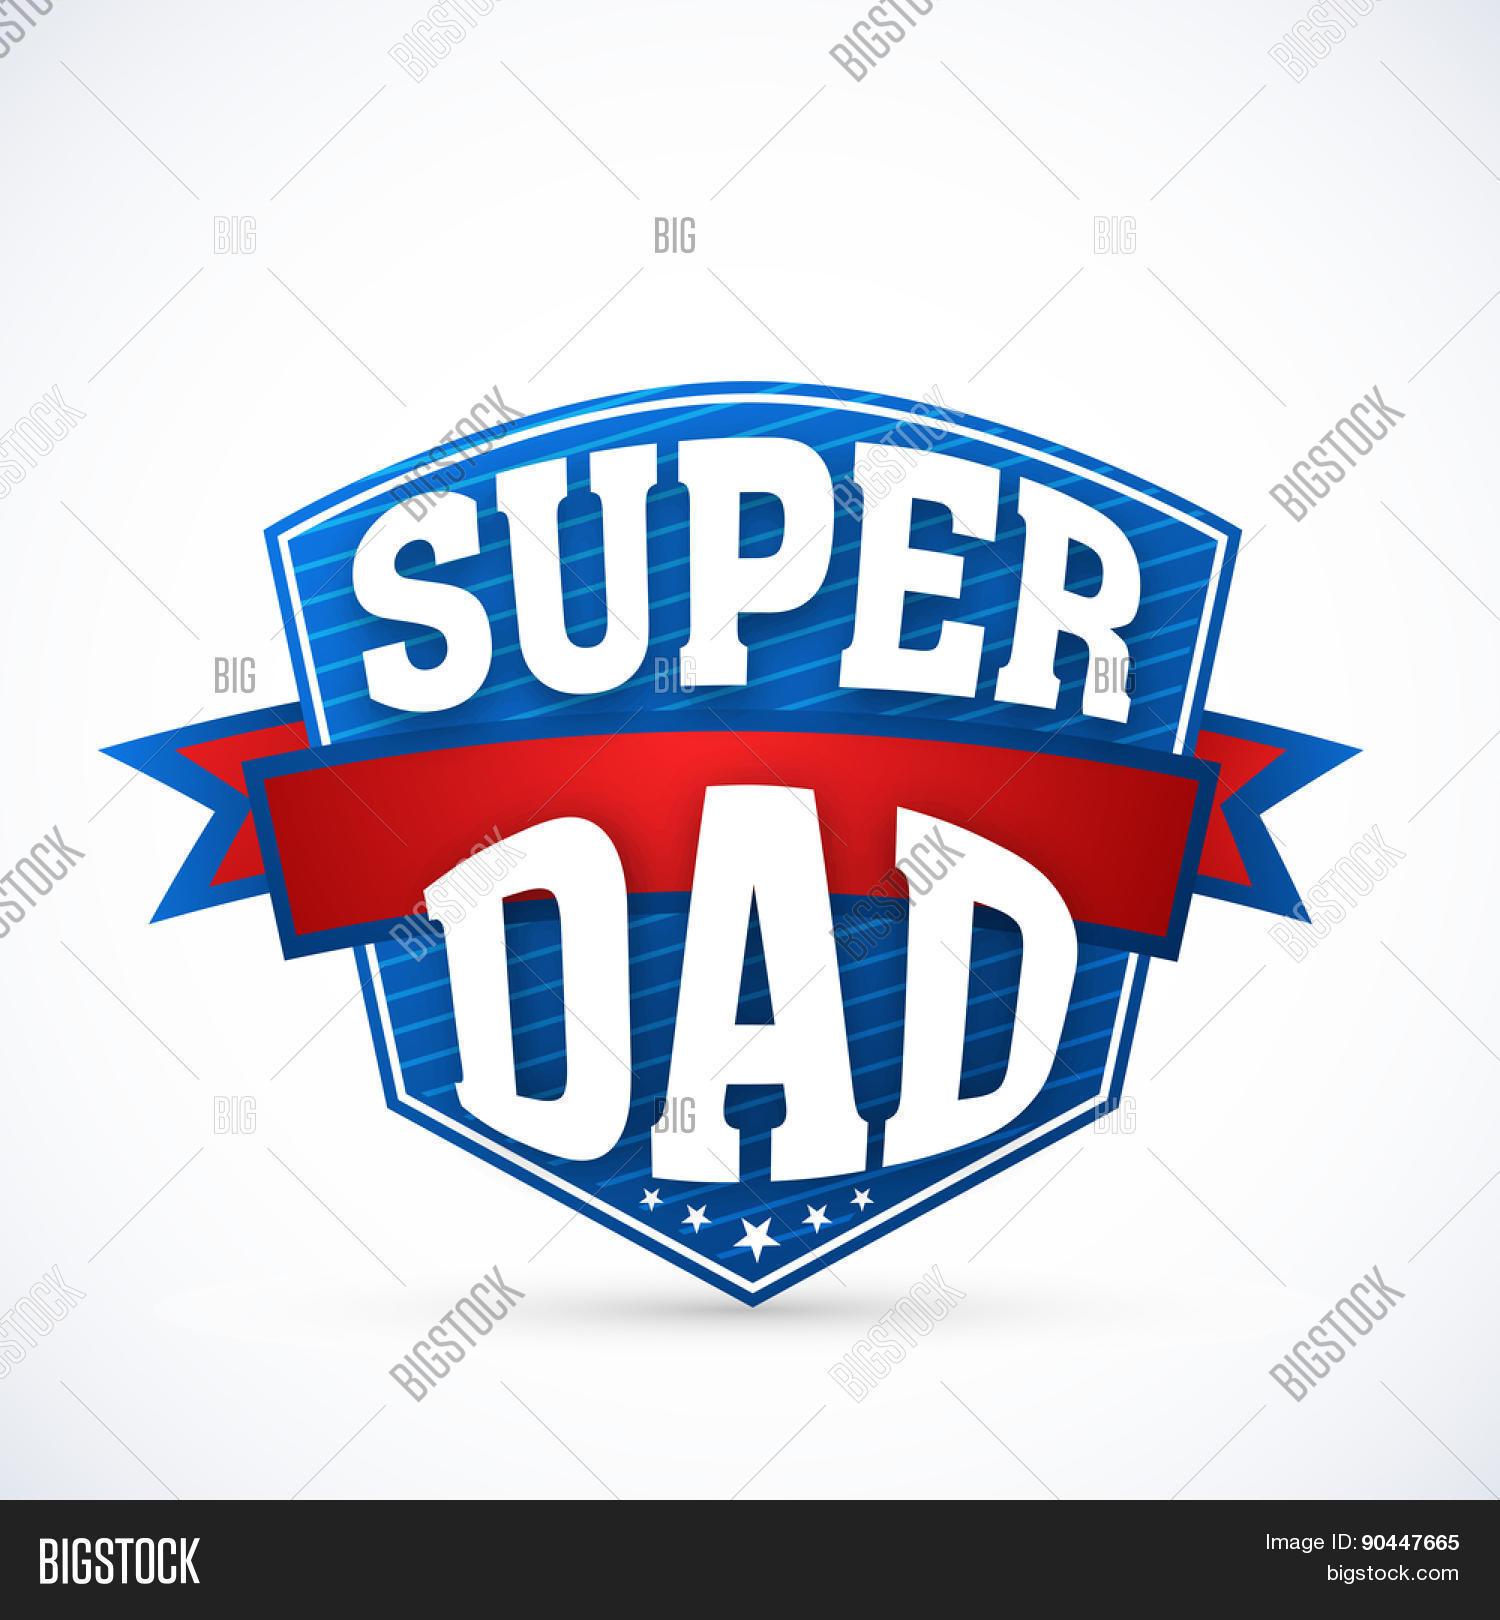 Happy Father's Day Celebrations Vector & Photo | Bigstock